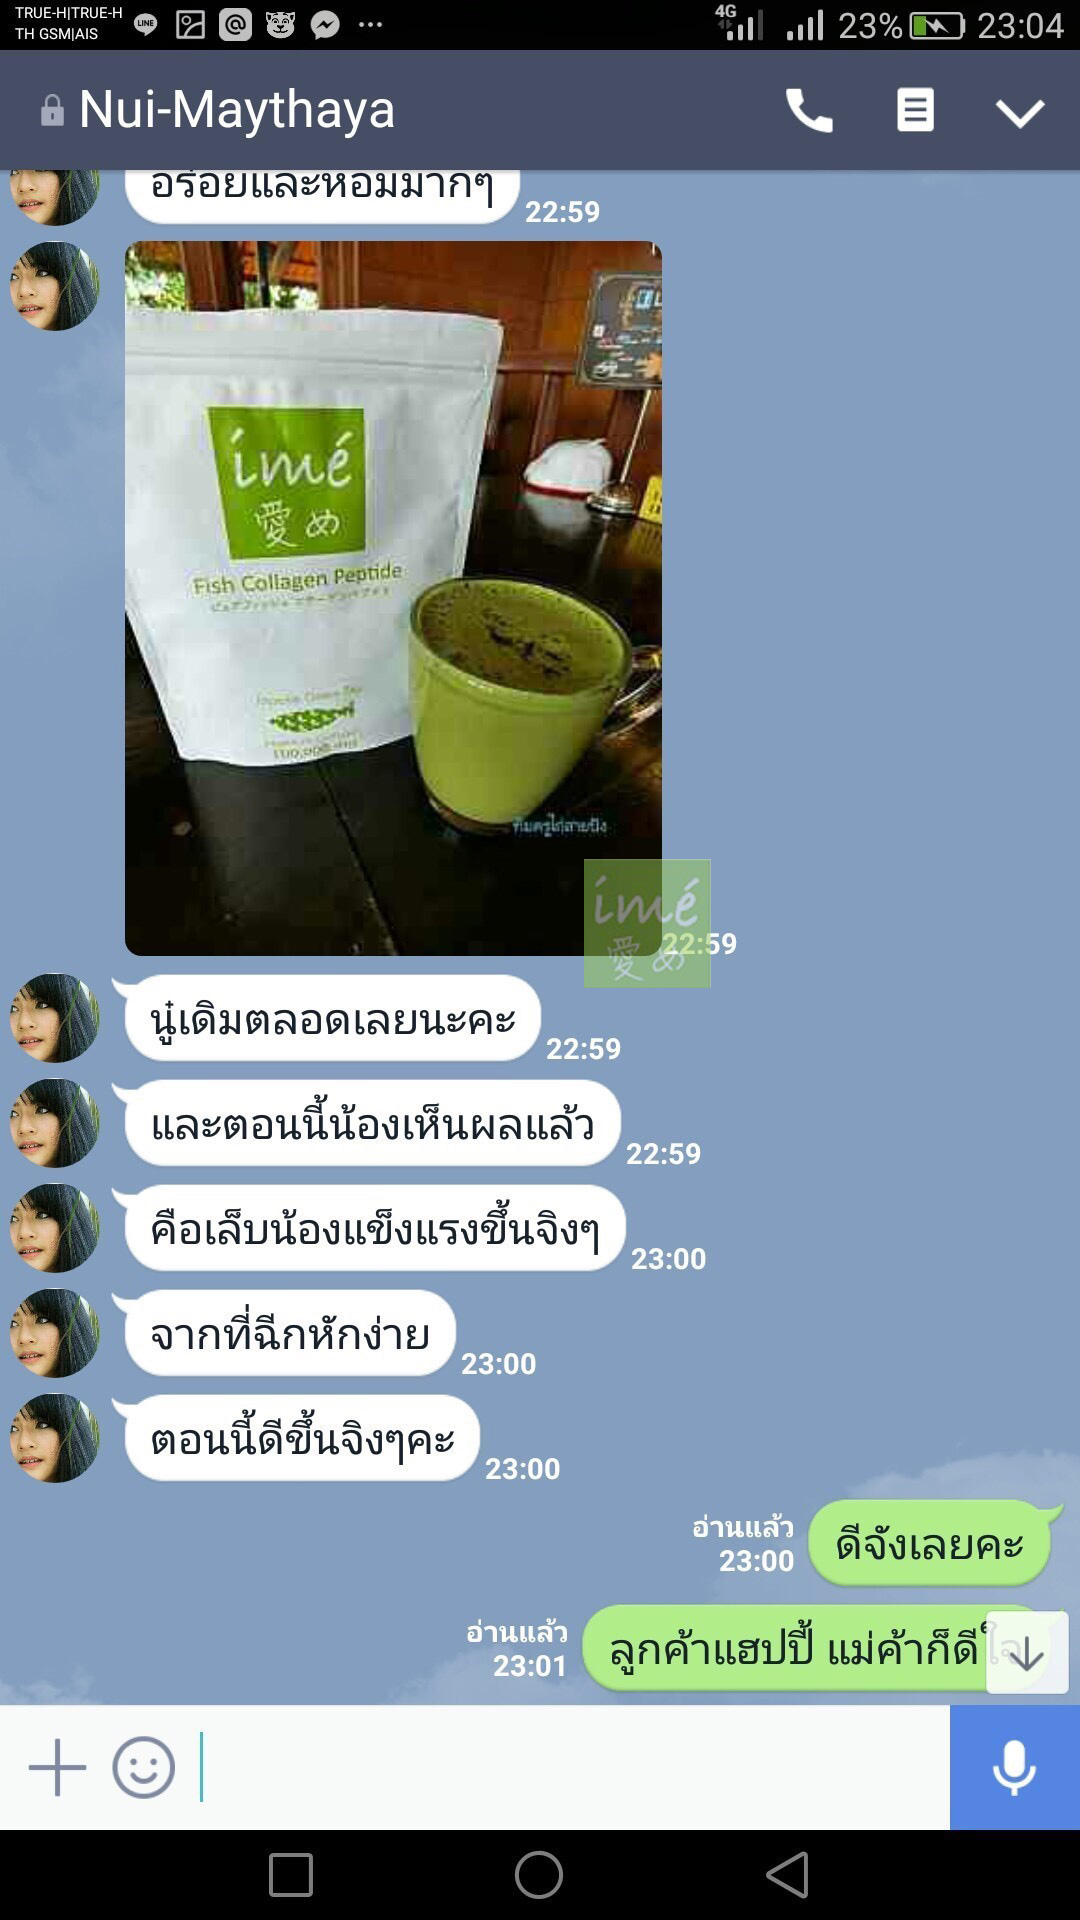 Ime Collagen Peptide Matcha Green Tea - ไอเม่ มัทฉะ ชาเขียว คอลลาเจนเปปไทด์จากปลา  (100 กรัม)